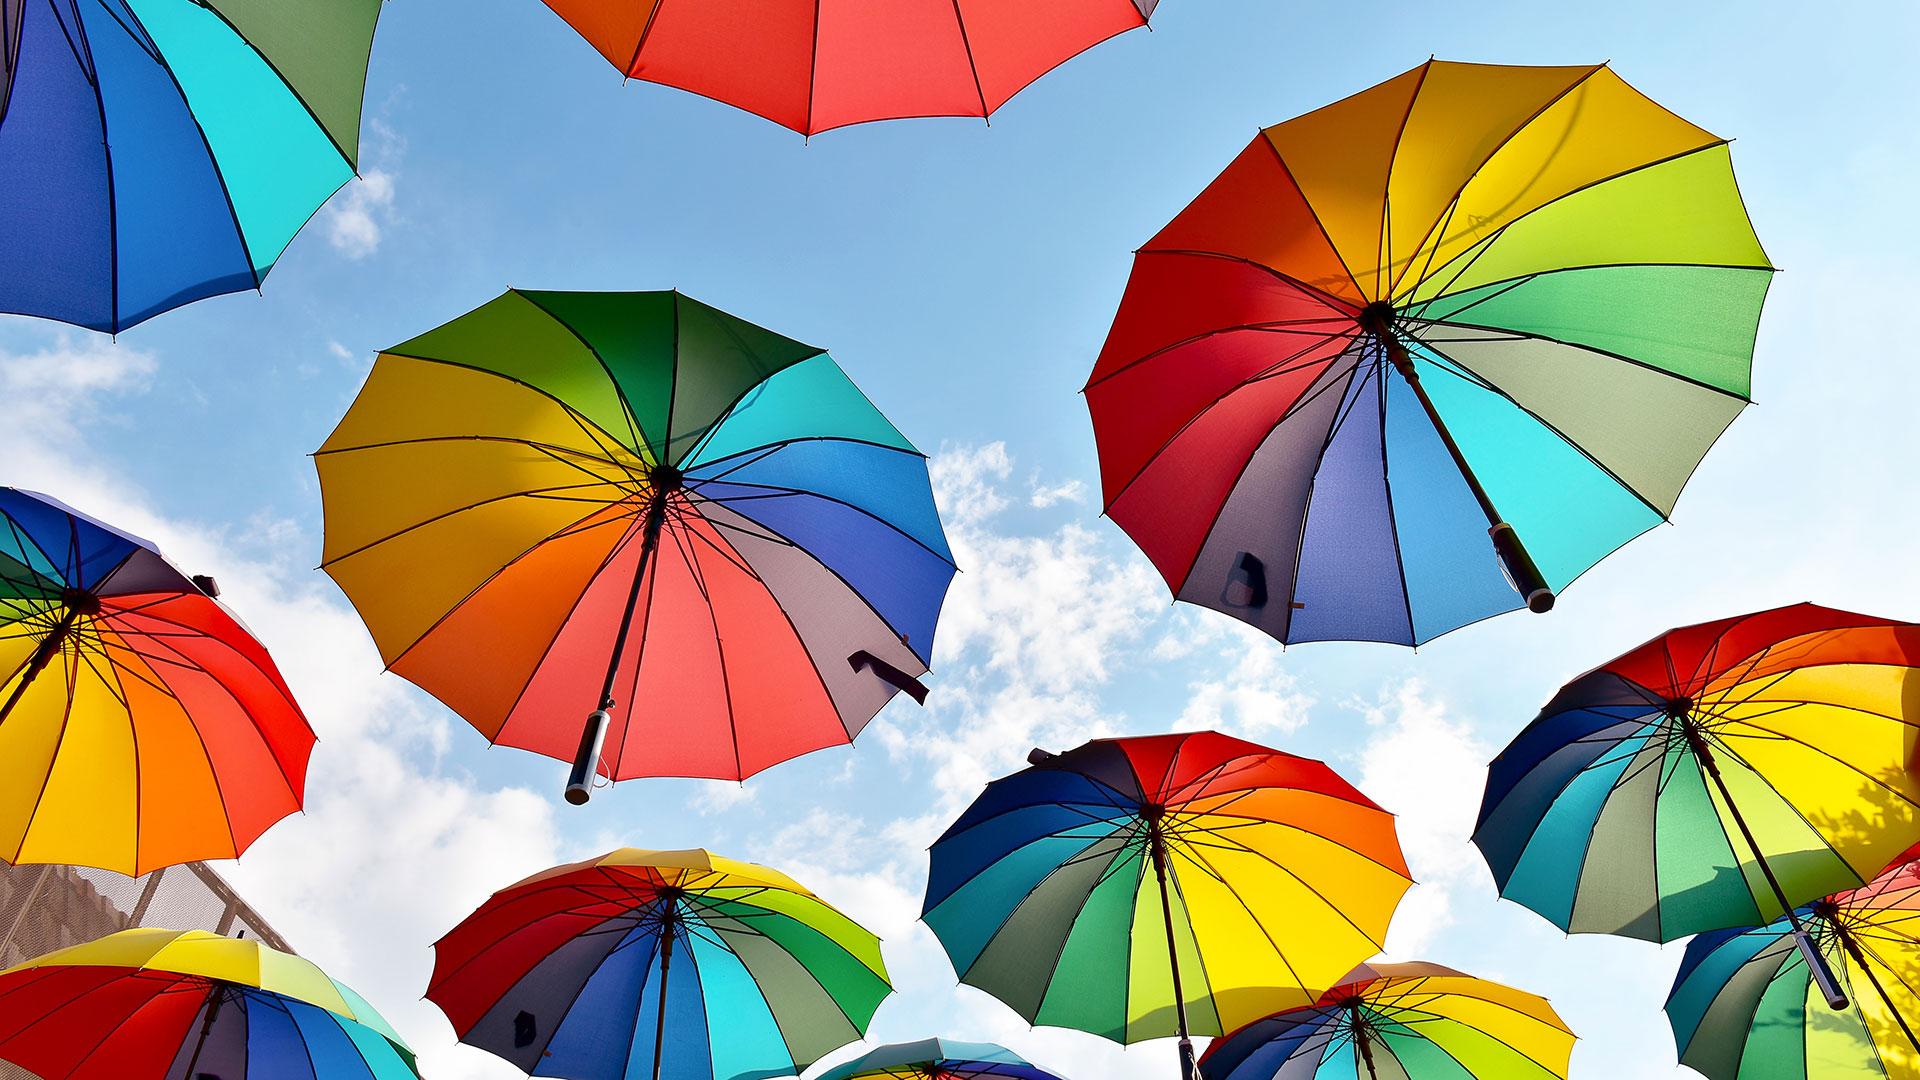 Rainbow coloured umbrellas in the blue sky